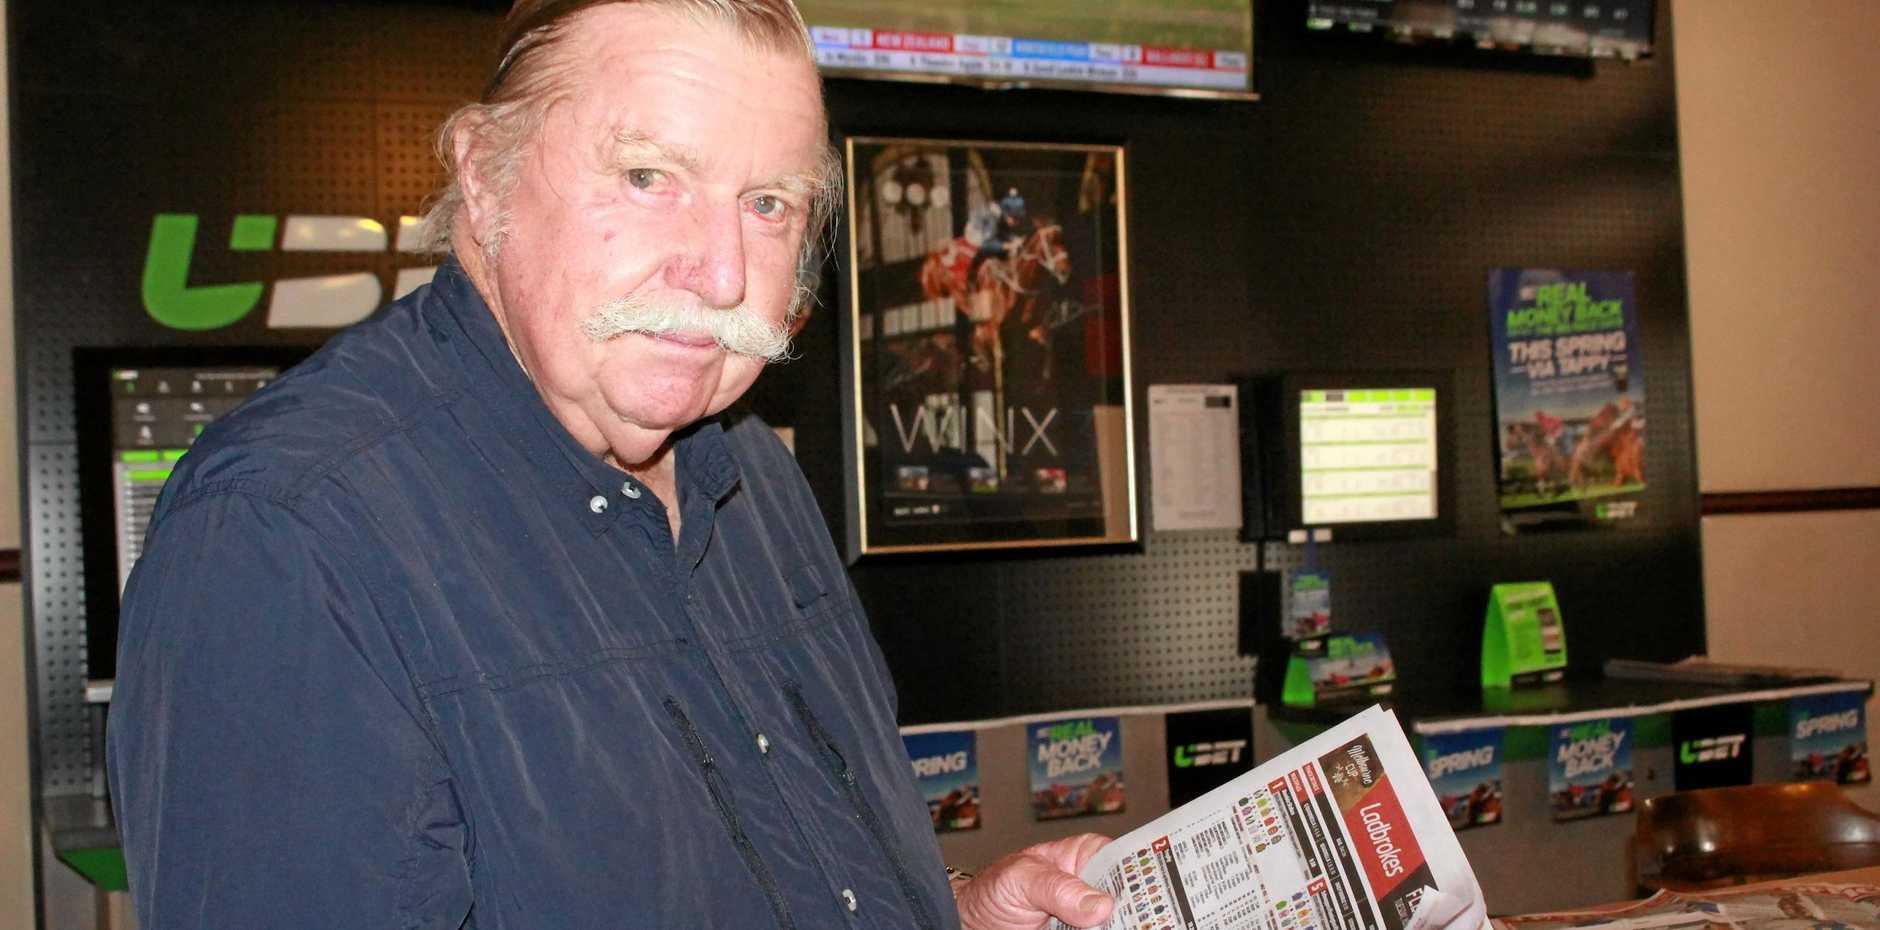 GREAT OZ: Warwick bookmaker John Thornton said the Melbourne Cup had